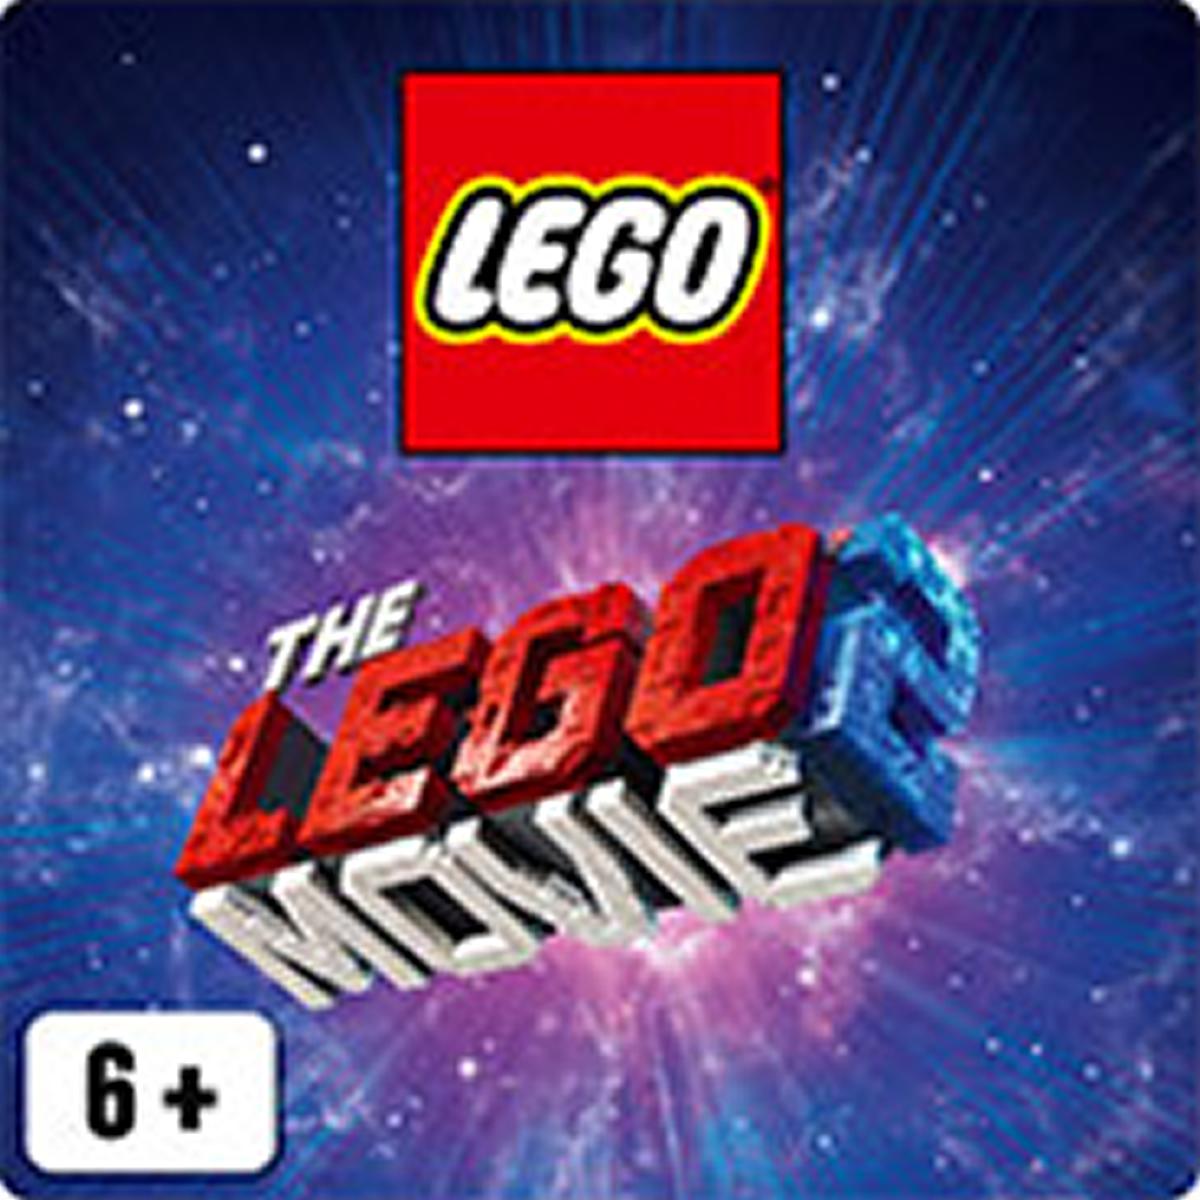 Lego, The Lego2 Movie